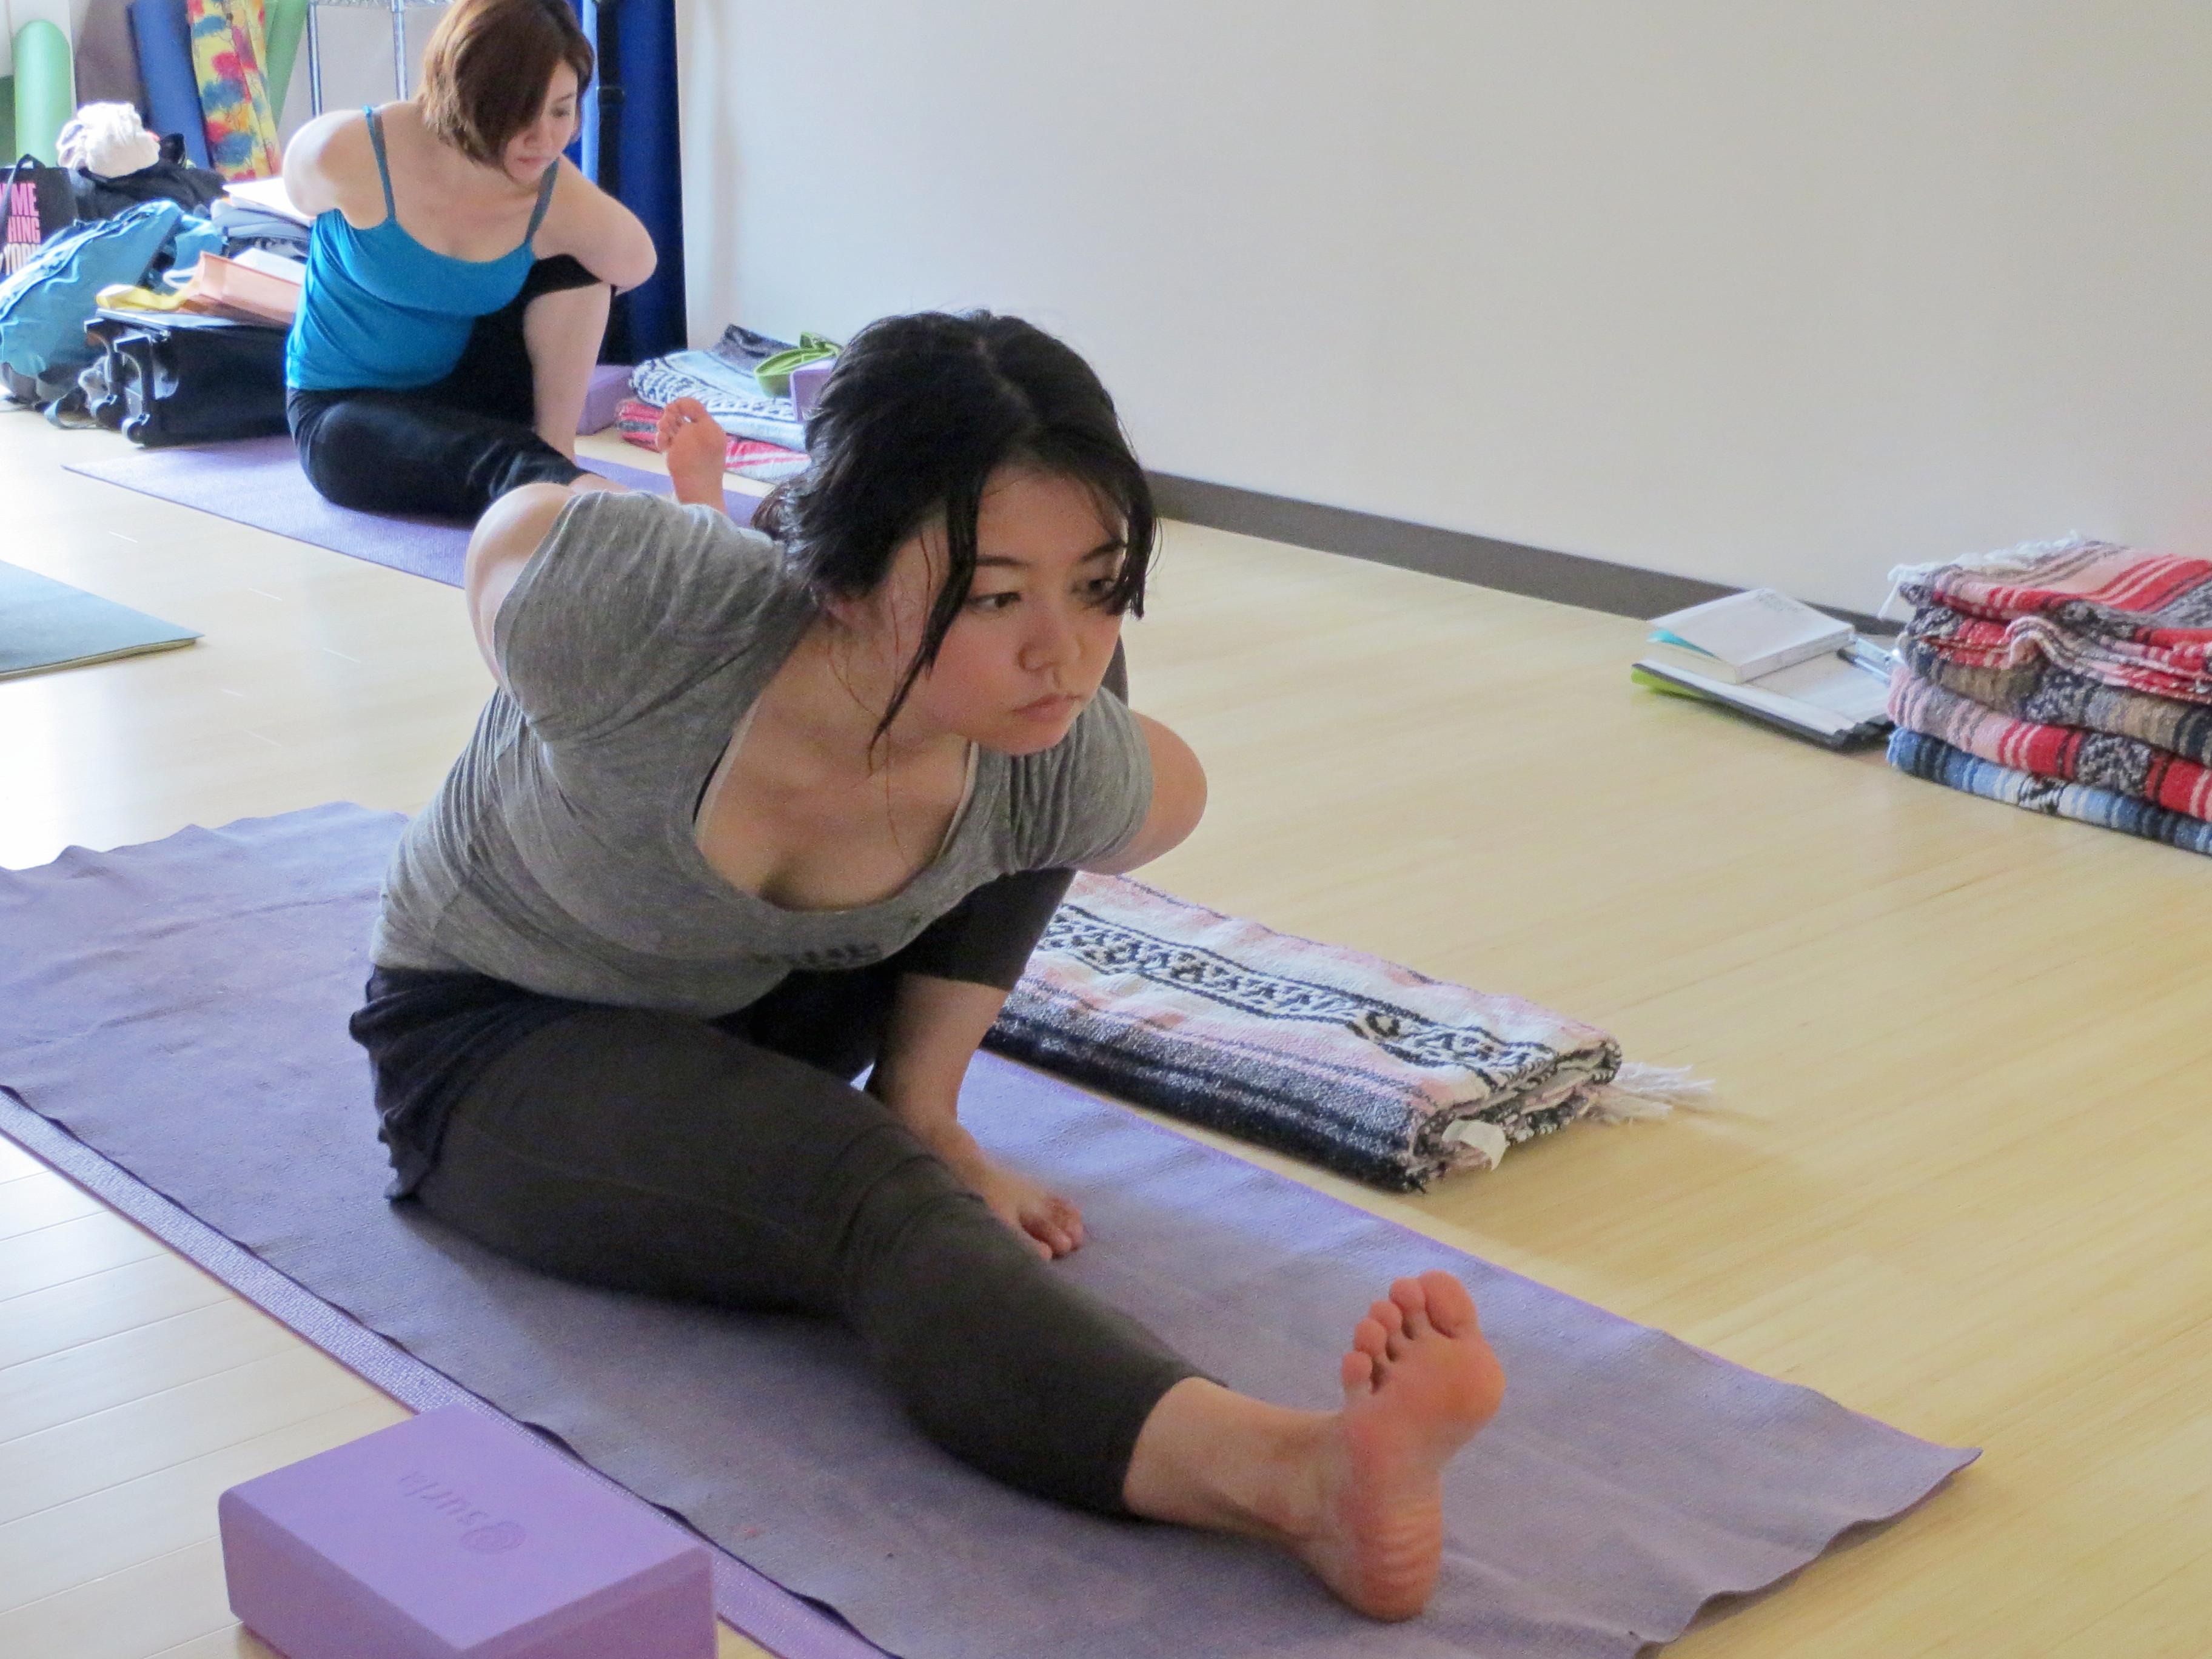 Paparazzi Feet Yoshiko Tanaka  nude (21 pictures), Facebook, lingerie